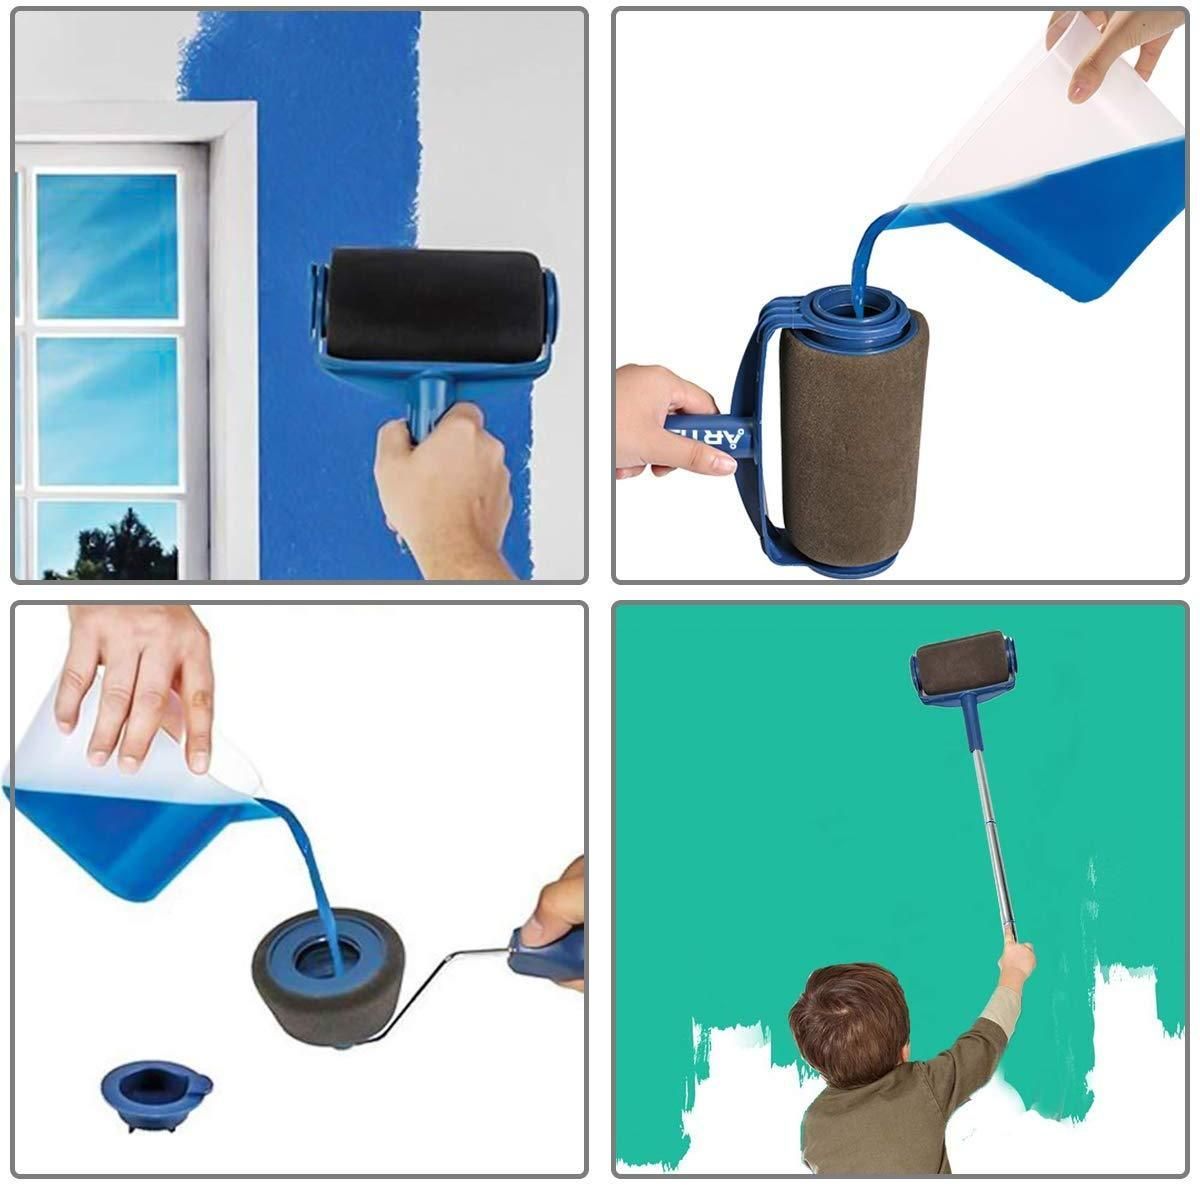 Multifunctional Paint Roller Brush Tools Set 8 Pcs In 2020 Paint Roller Roller Brush Paint Runner